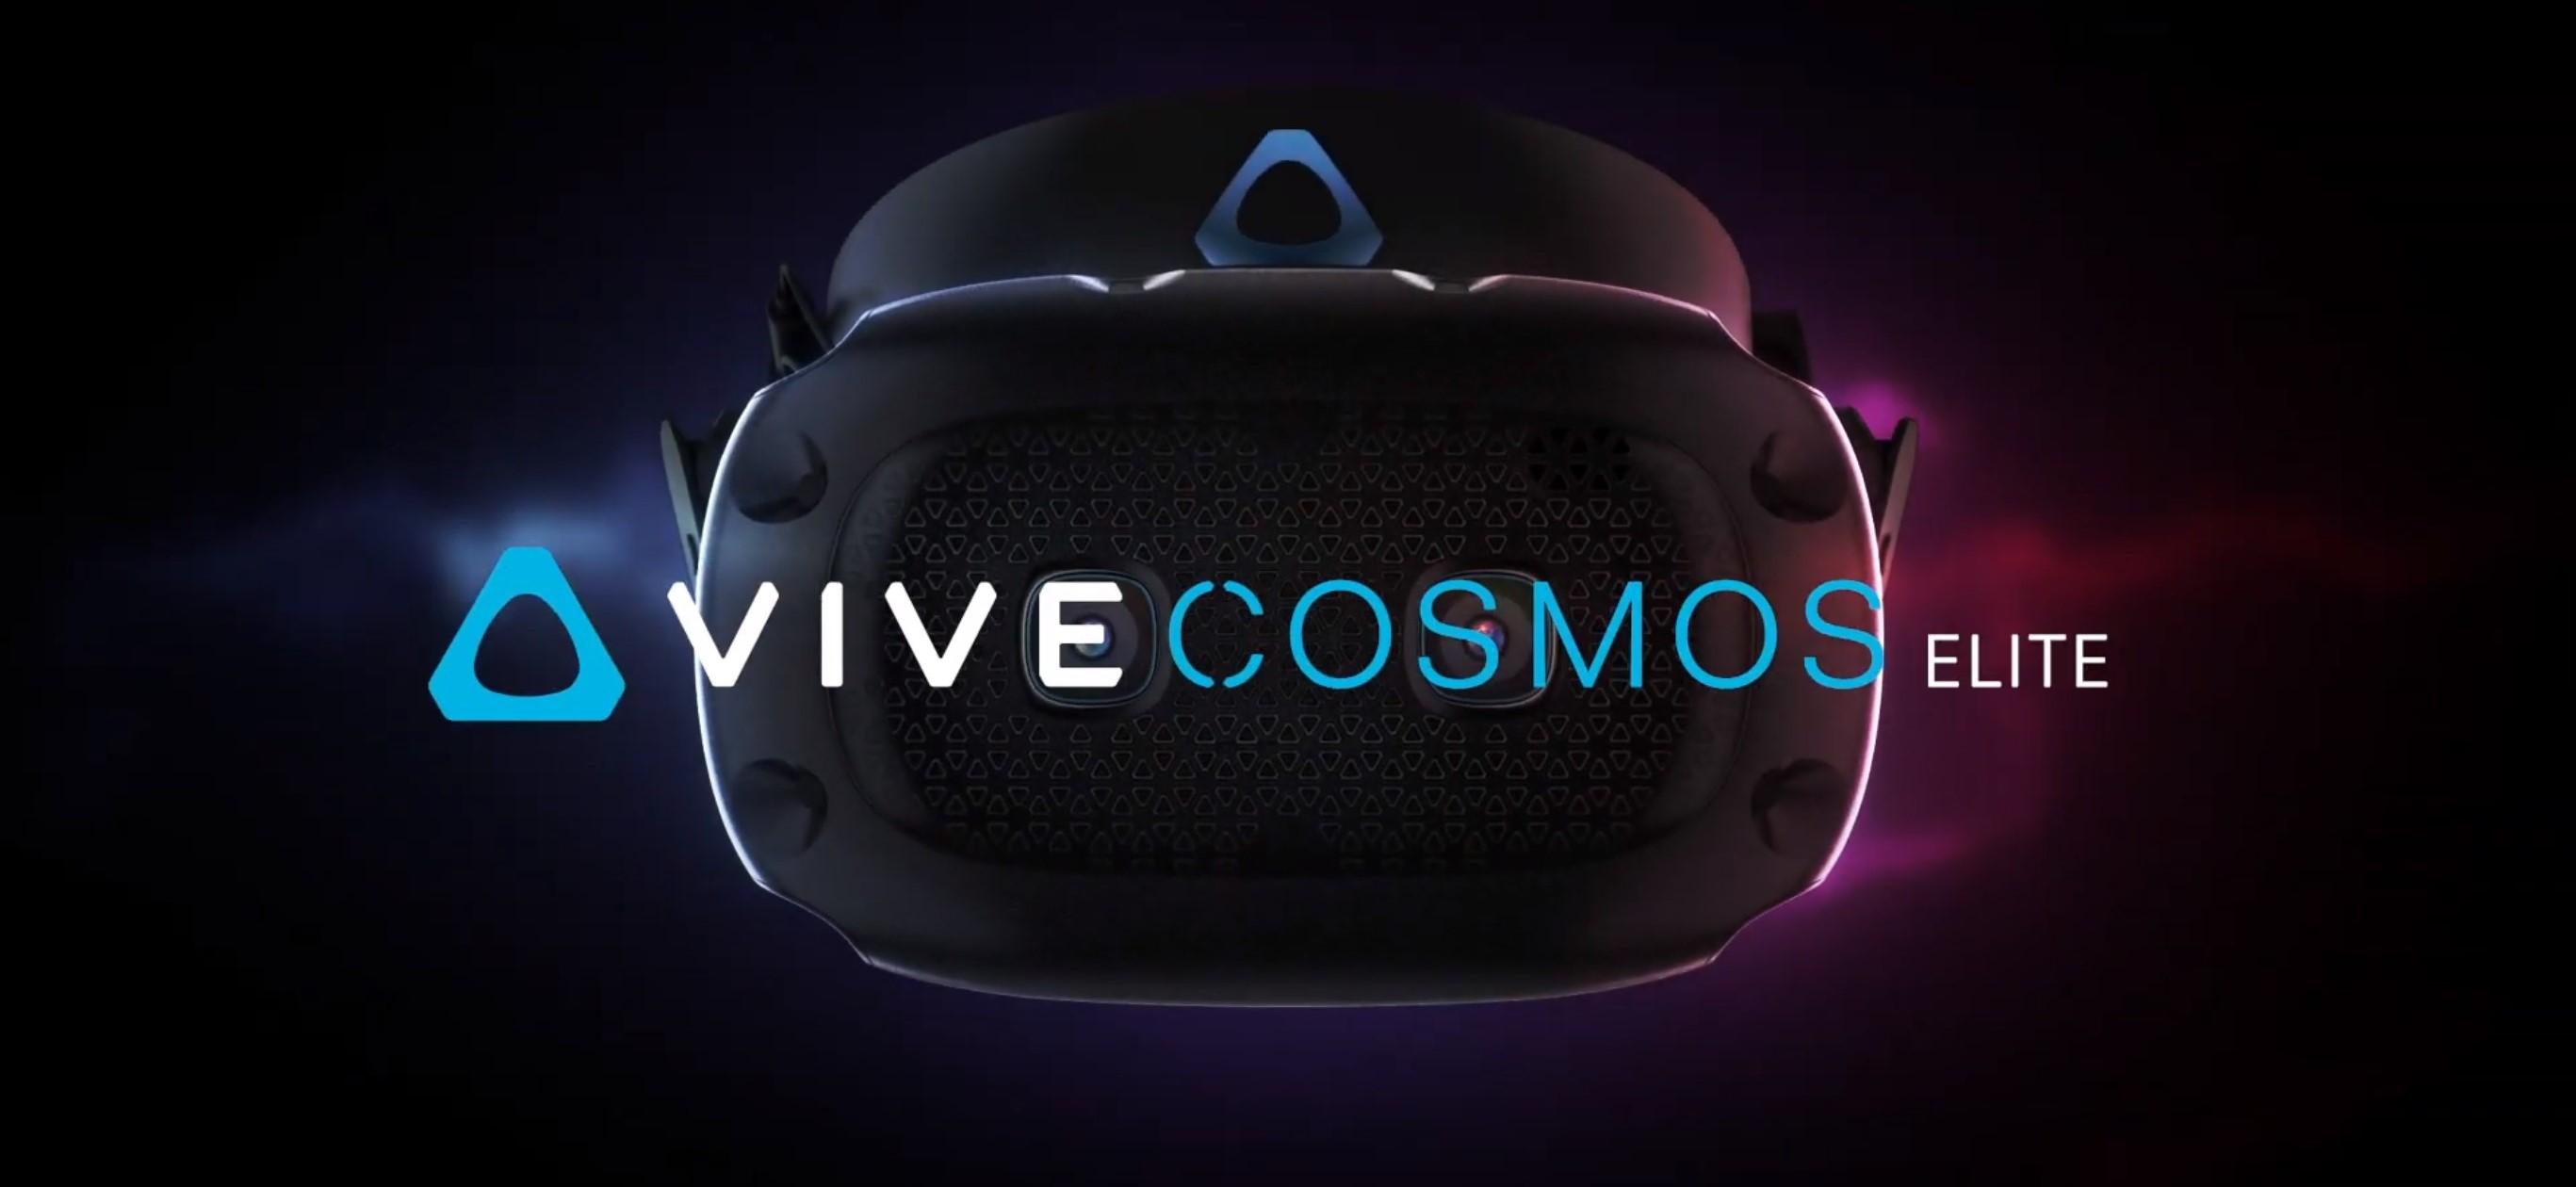 Half-Life: Alyx gratis do zamówień zestawu VR HTC Vive Cosmos Elite